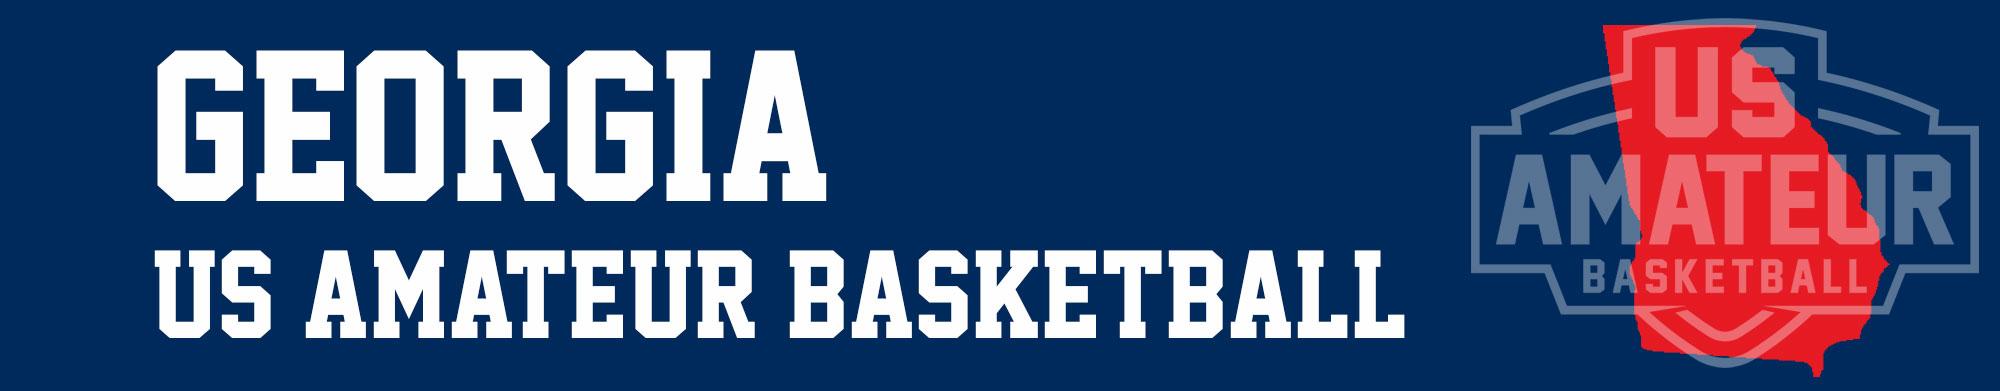 Georgia US Amateur Basketball